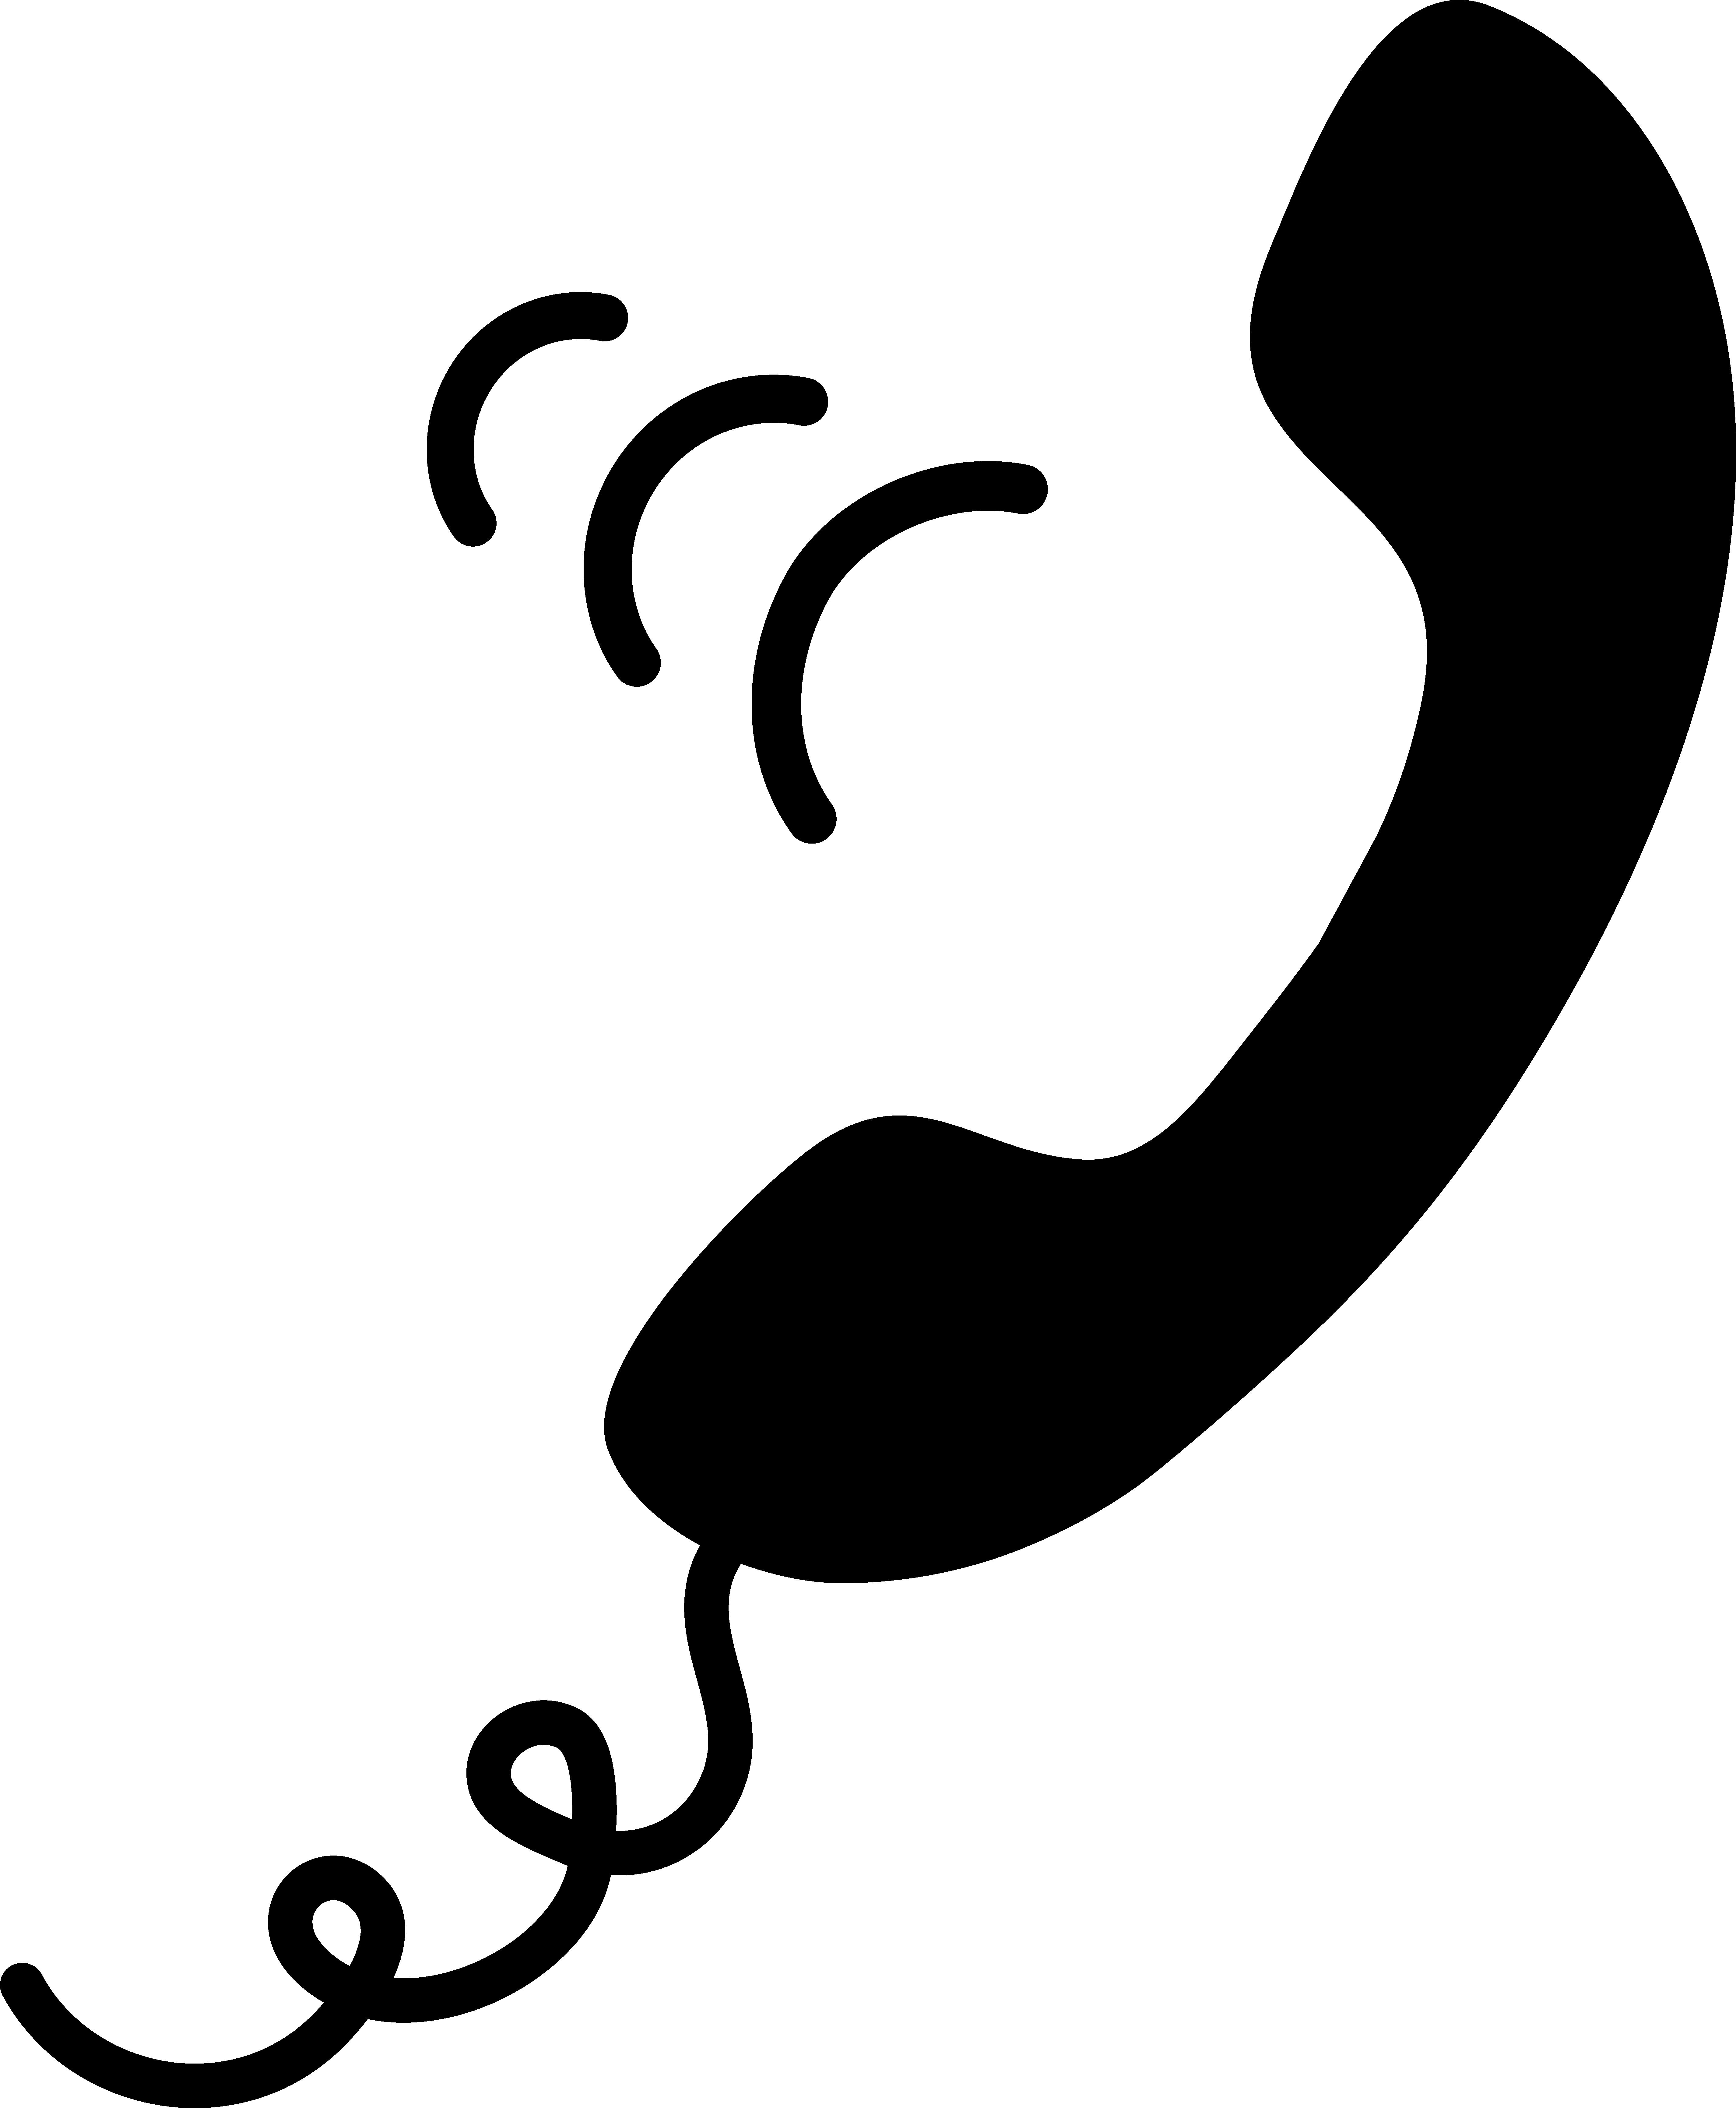 5702x6922 Cell Phone Text Clipart Clipart Panda